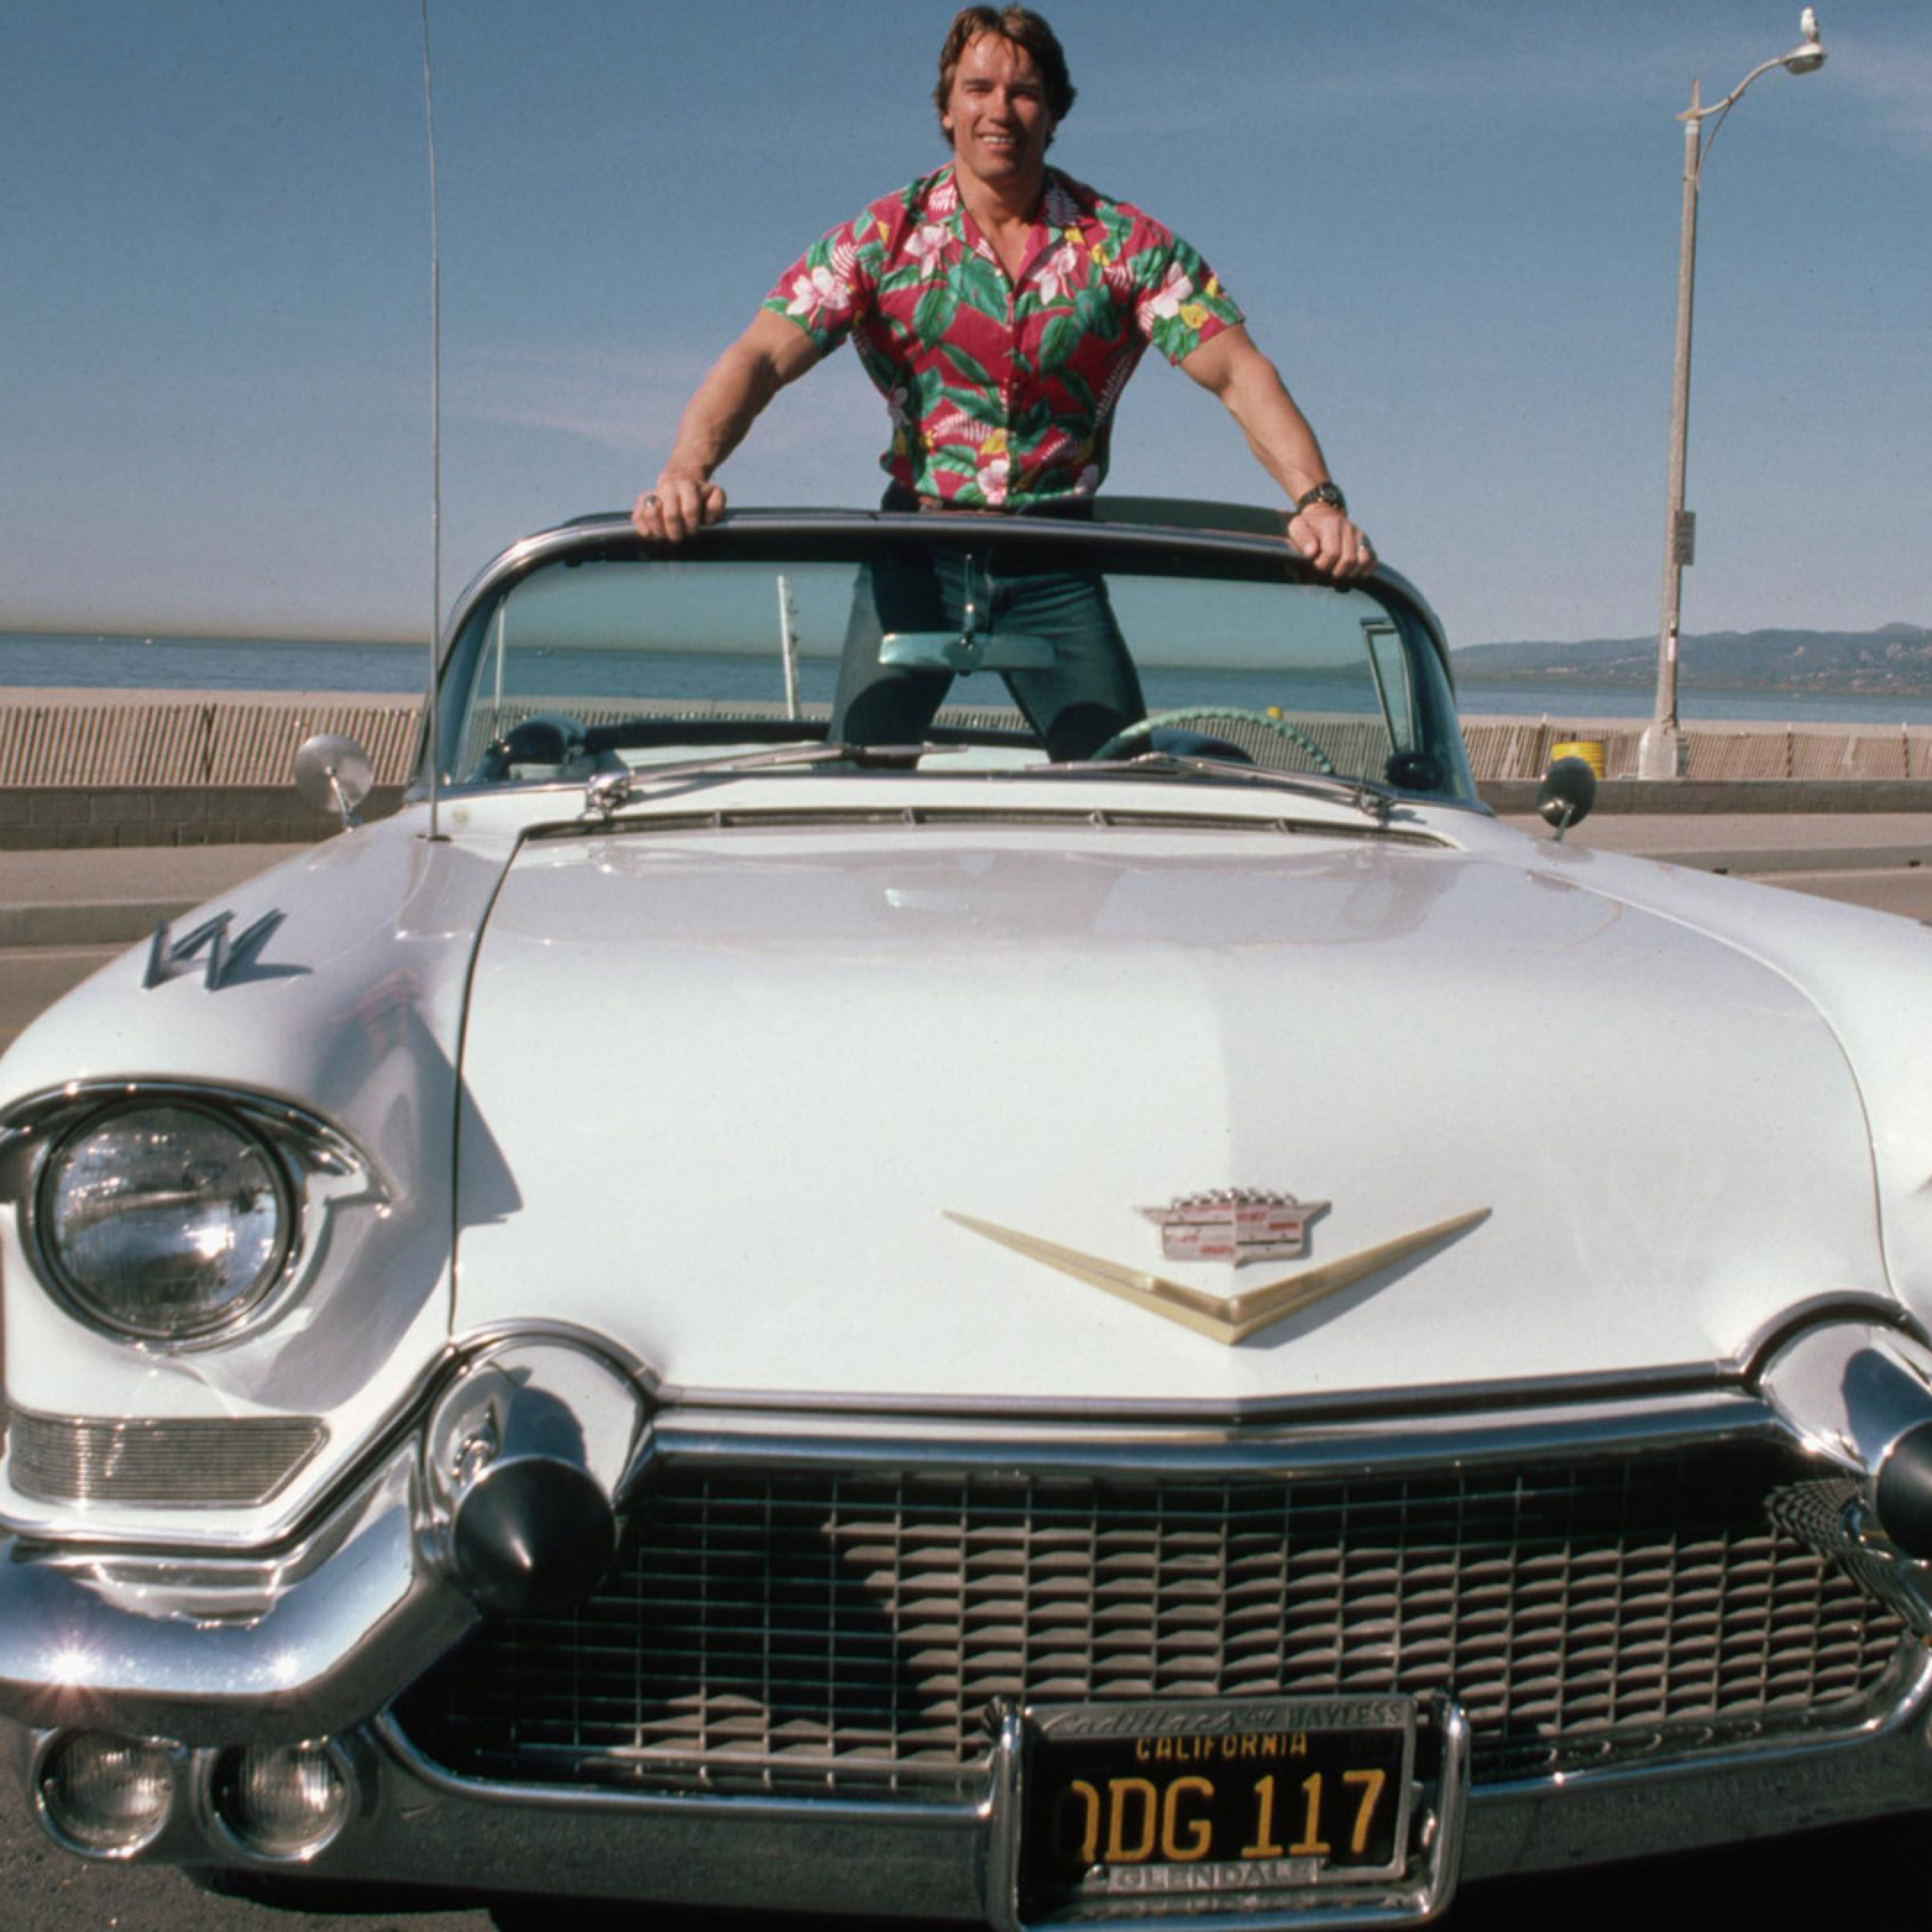 Download Arnold Schwarzenegger In Car Wallpapers Apple iPad Air 2780x2780